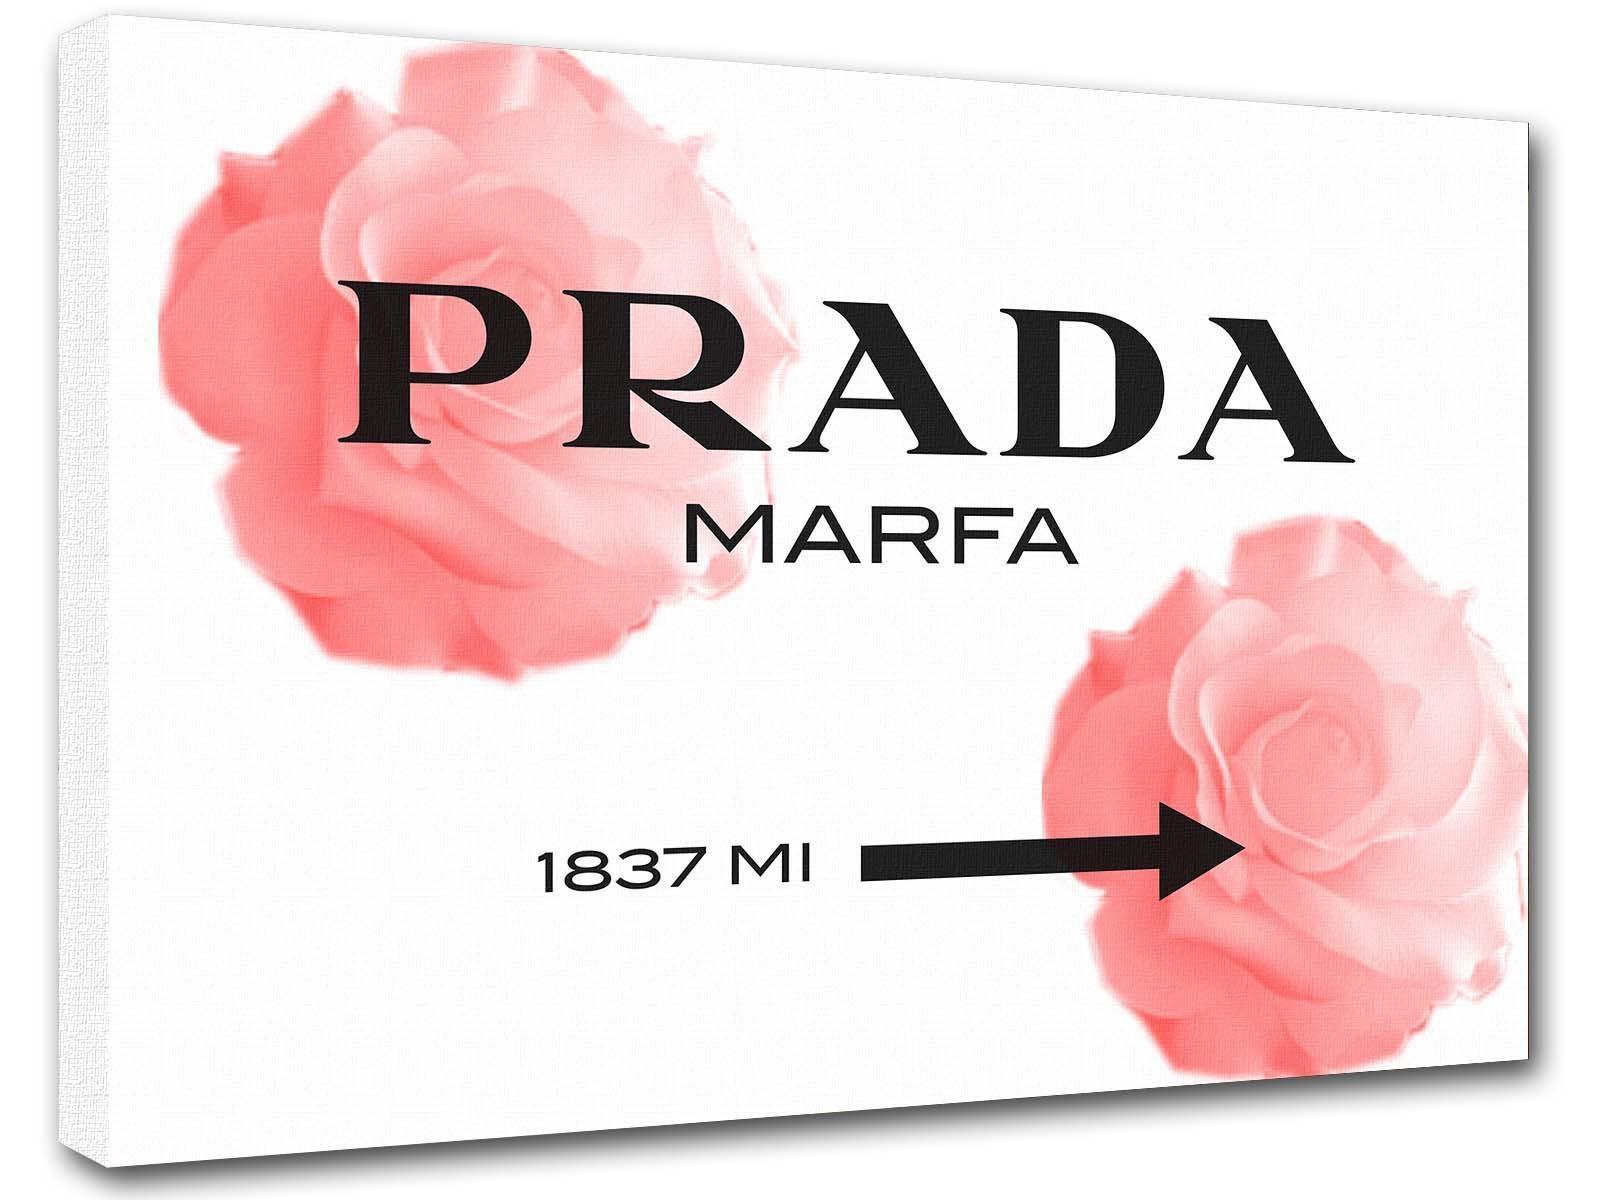 Marfa Gossip Girl Abstract Painting, Rose Art, Interior Decoration Intended For Prada Marfa Wall Art (Image 10 of 20)